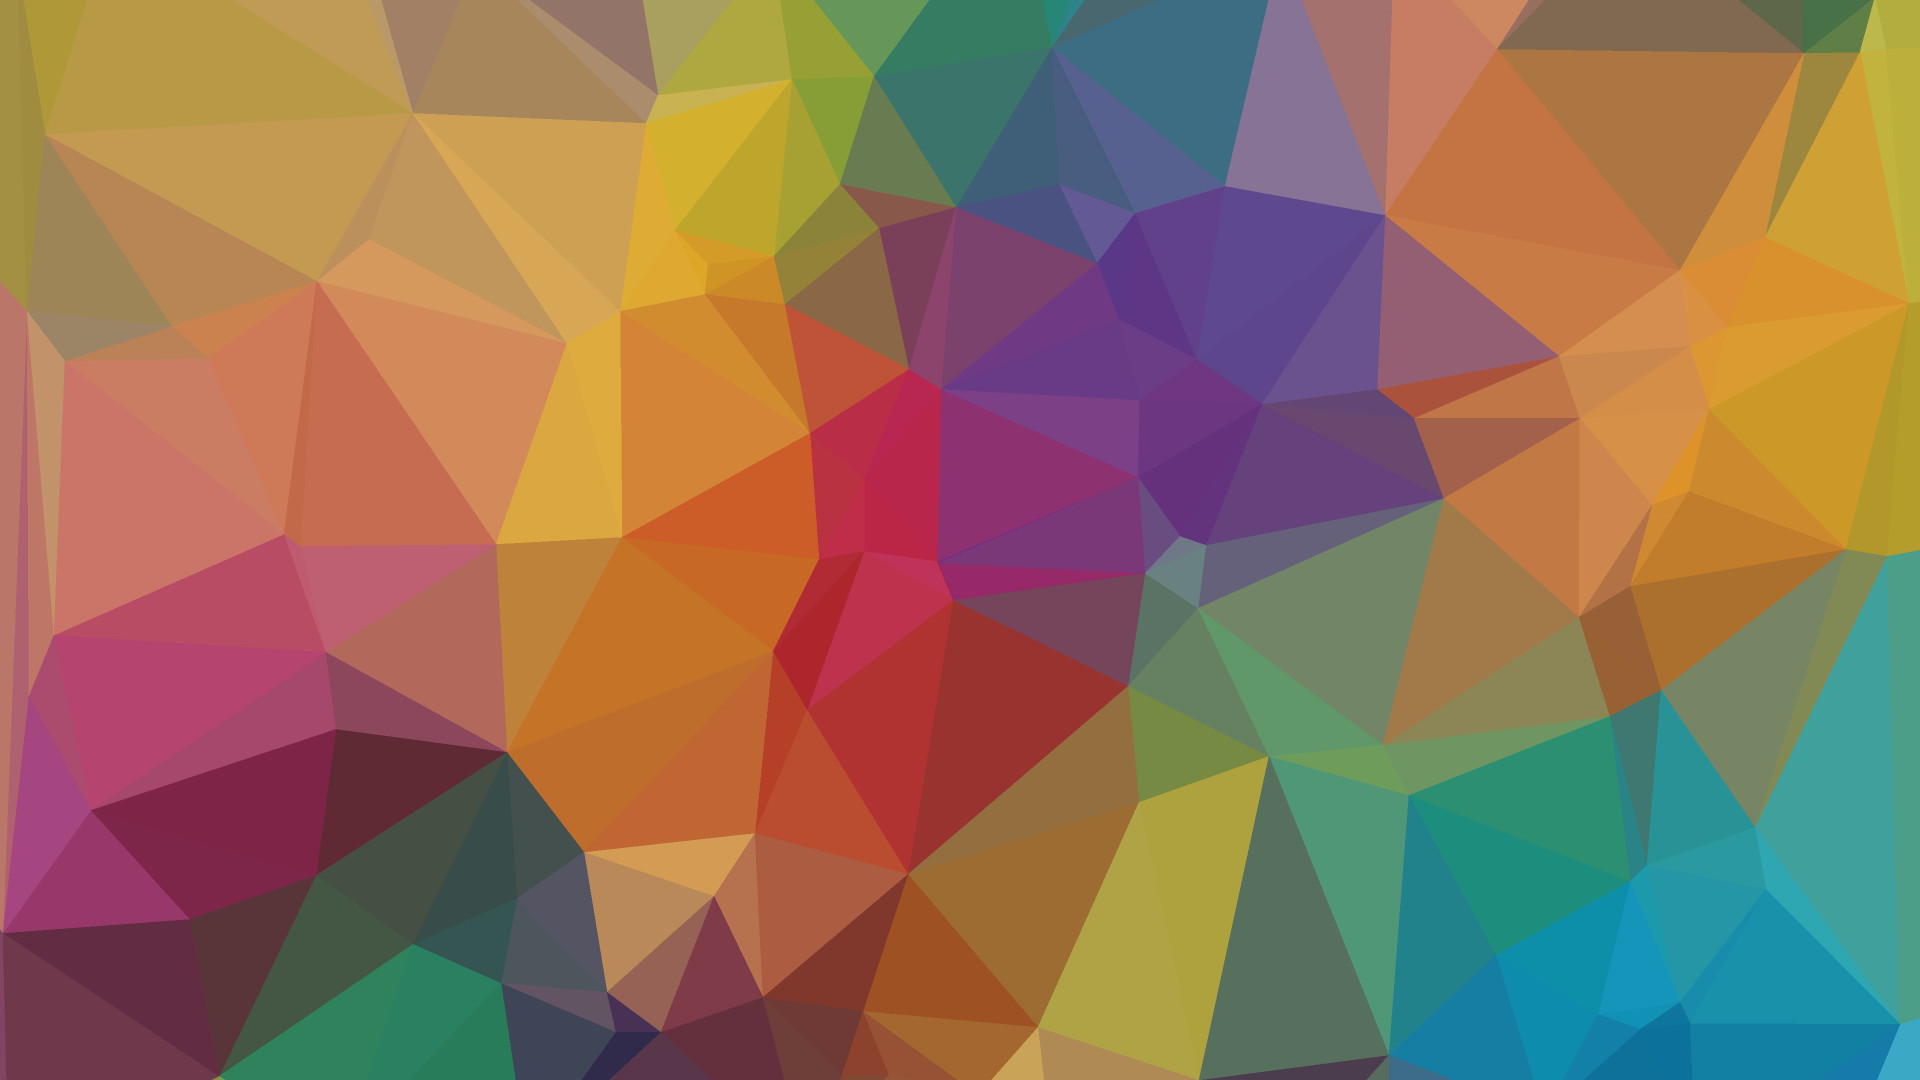 Free Colorful Geometric Wallpaper: HD Geometric Wallpaper (82+ Images